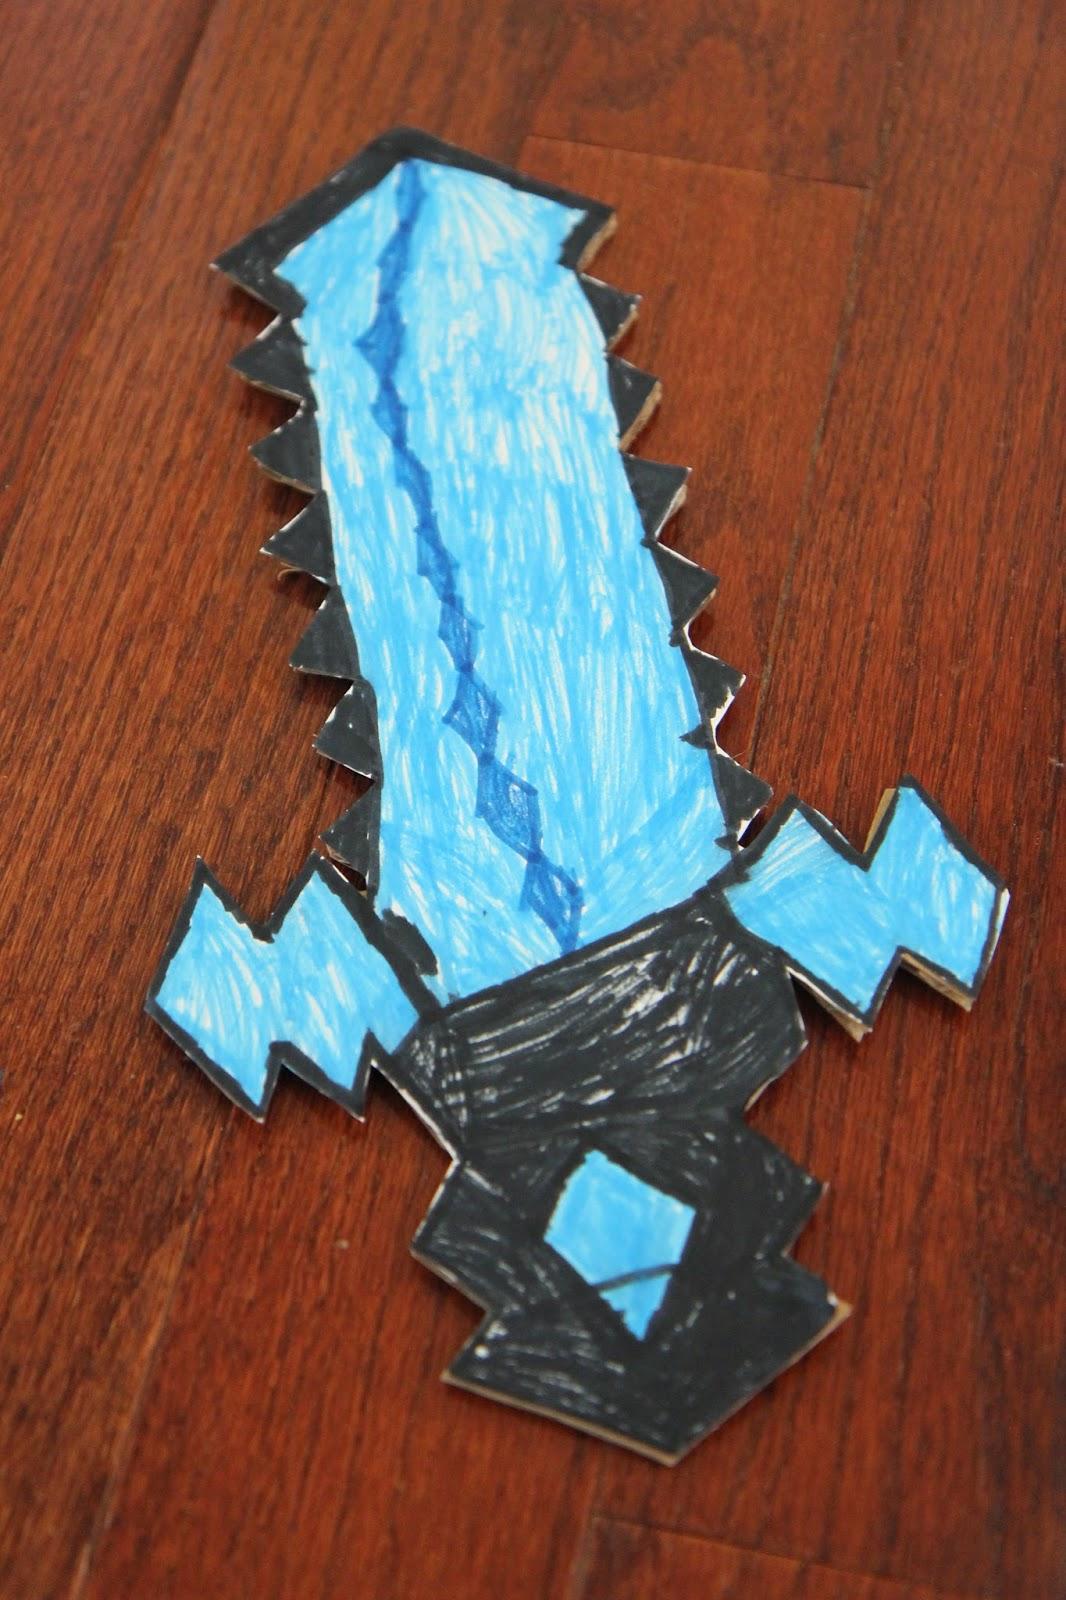 Toddler Approved Diy Cardboard Minecraft Sword Free Printable